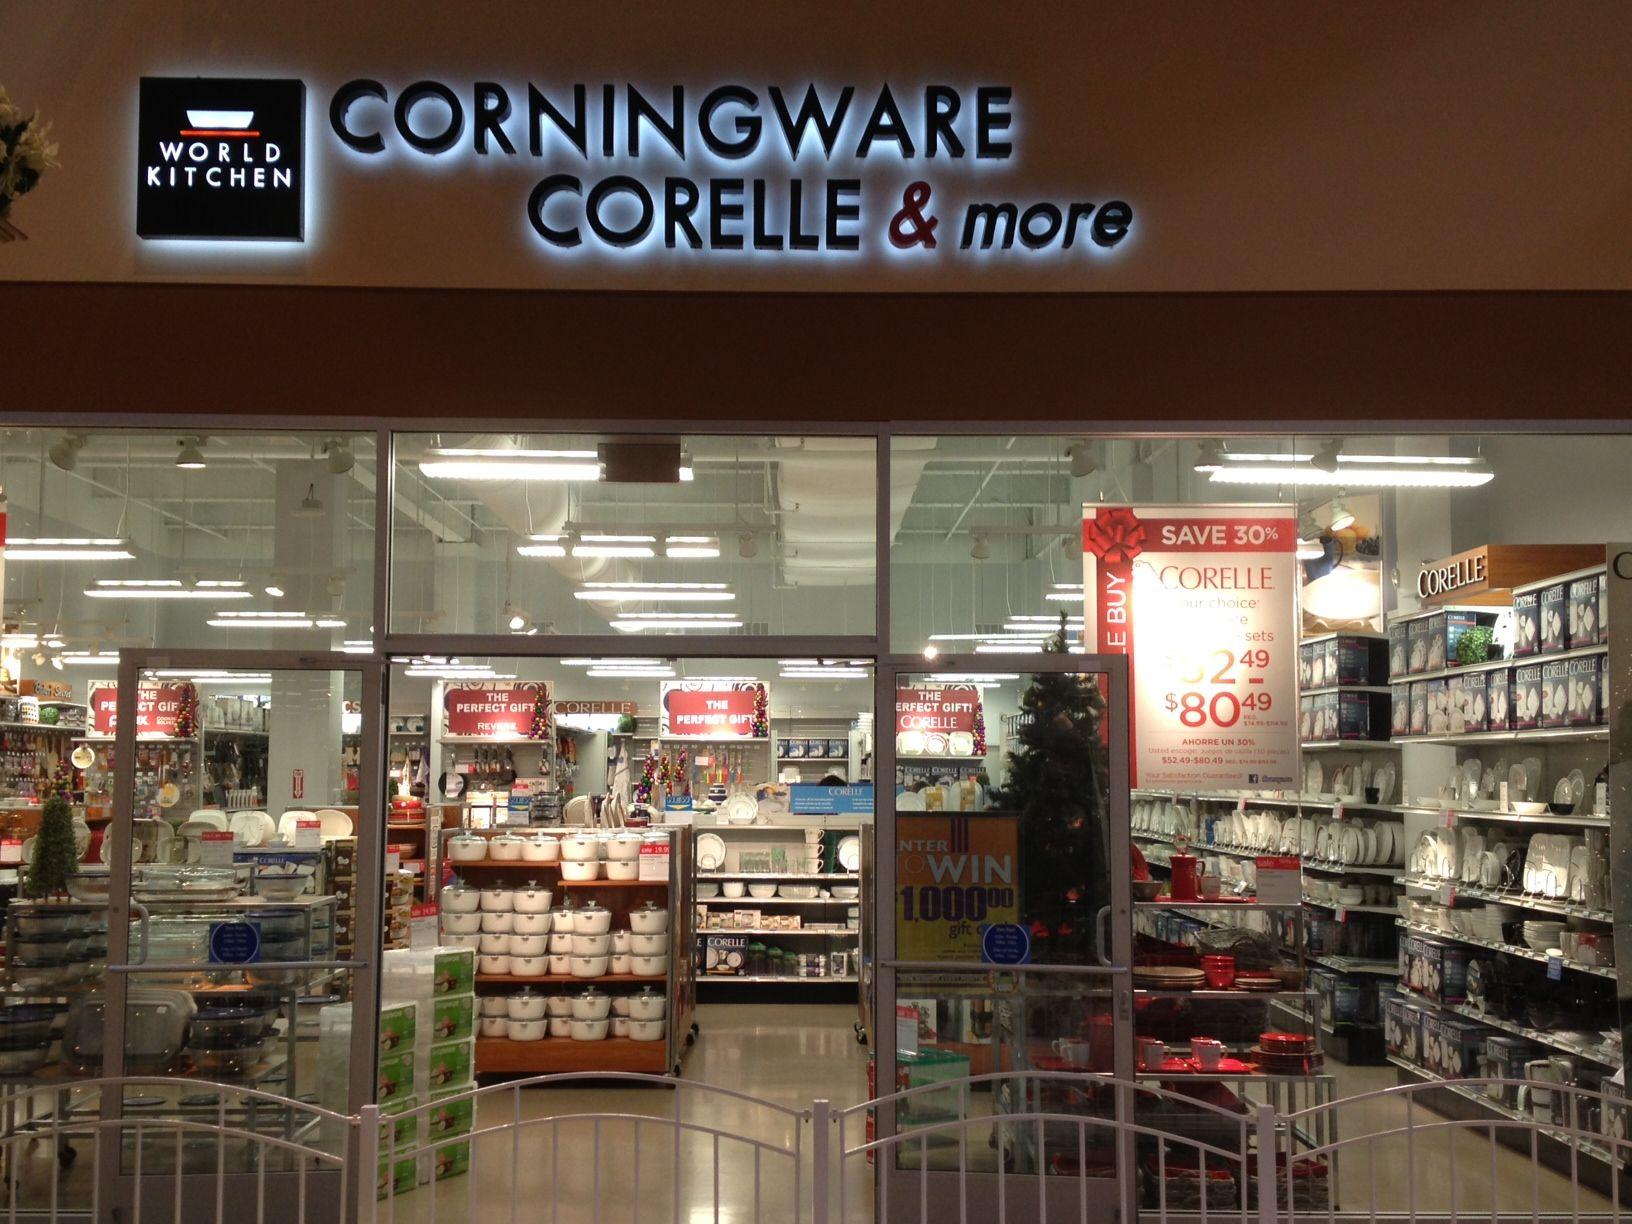 Corningware corelle and more - Footlocker ca sale